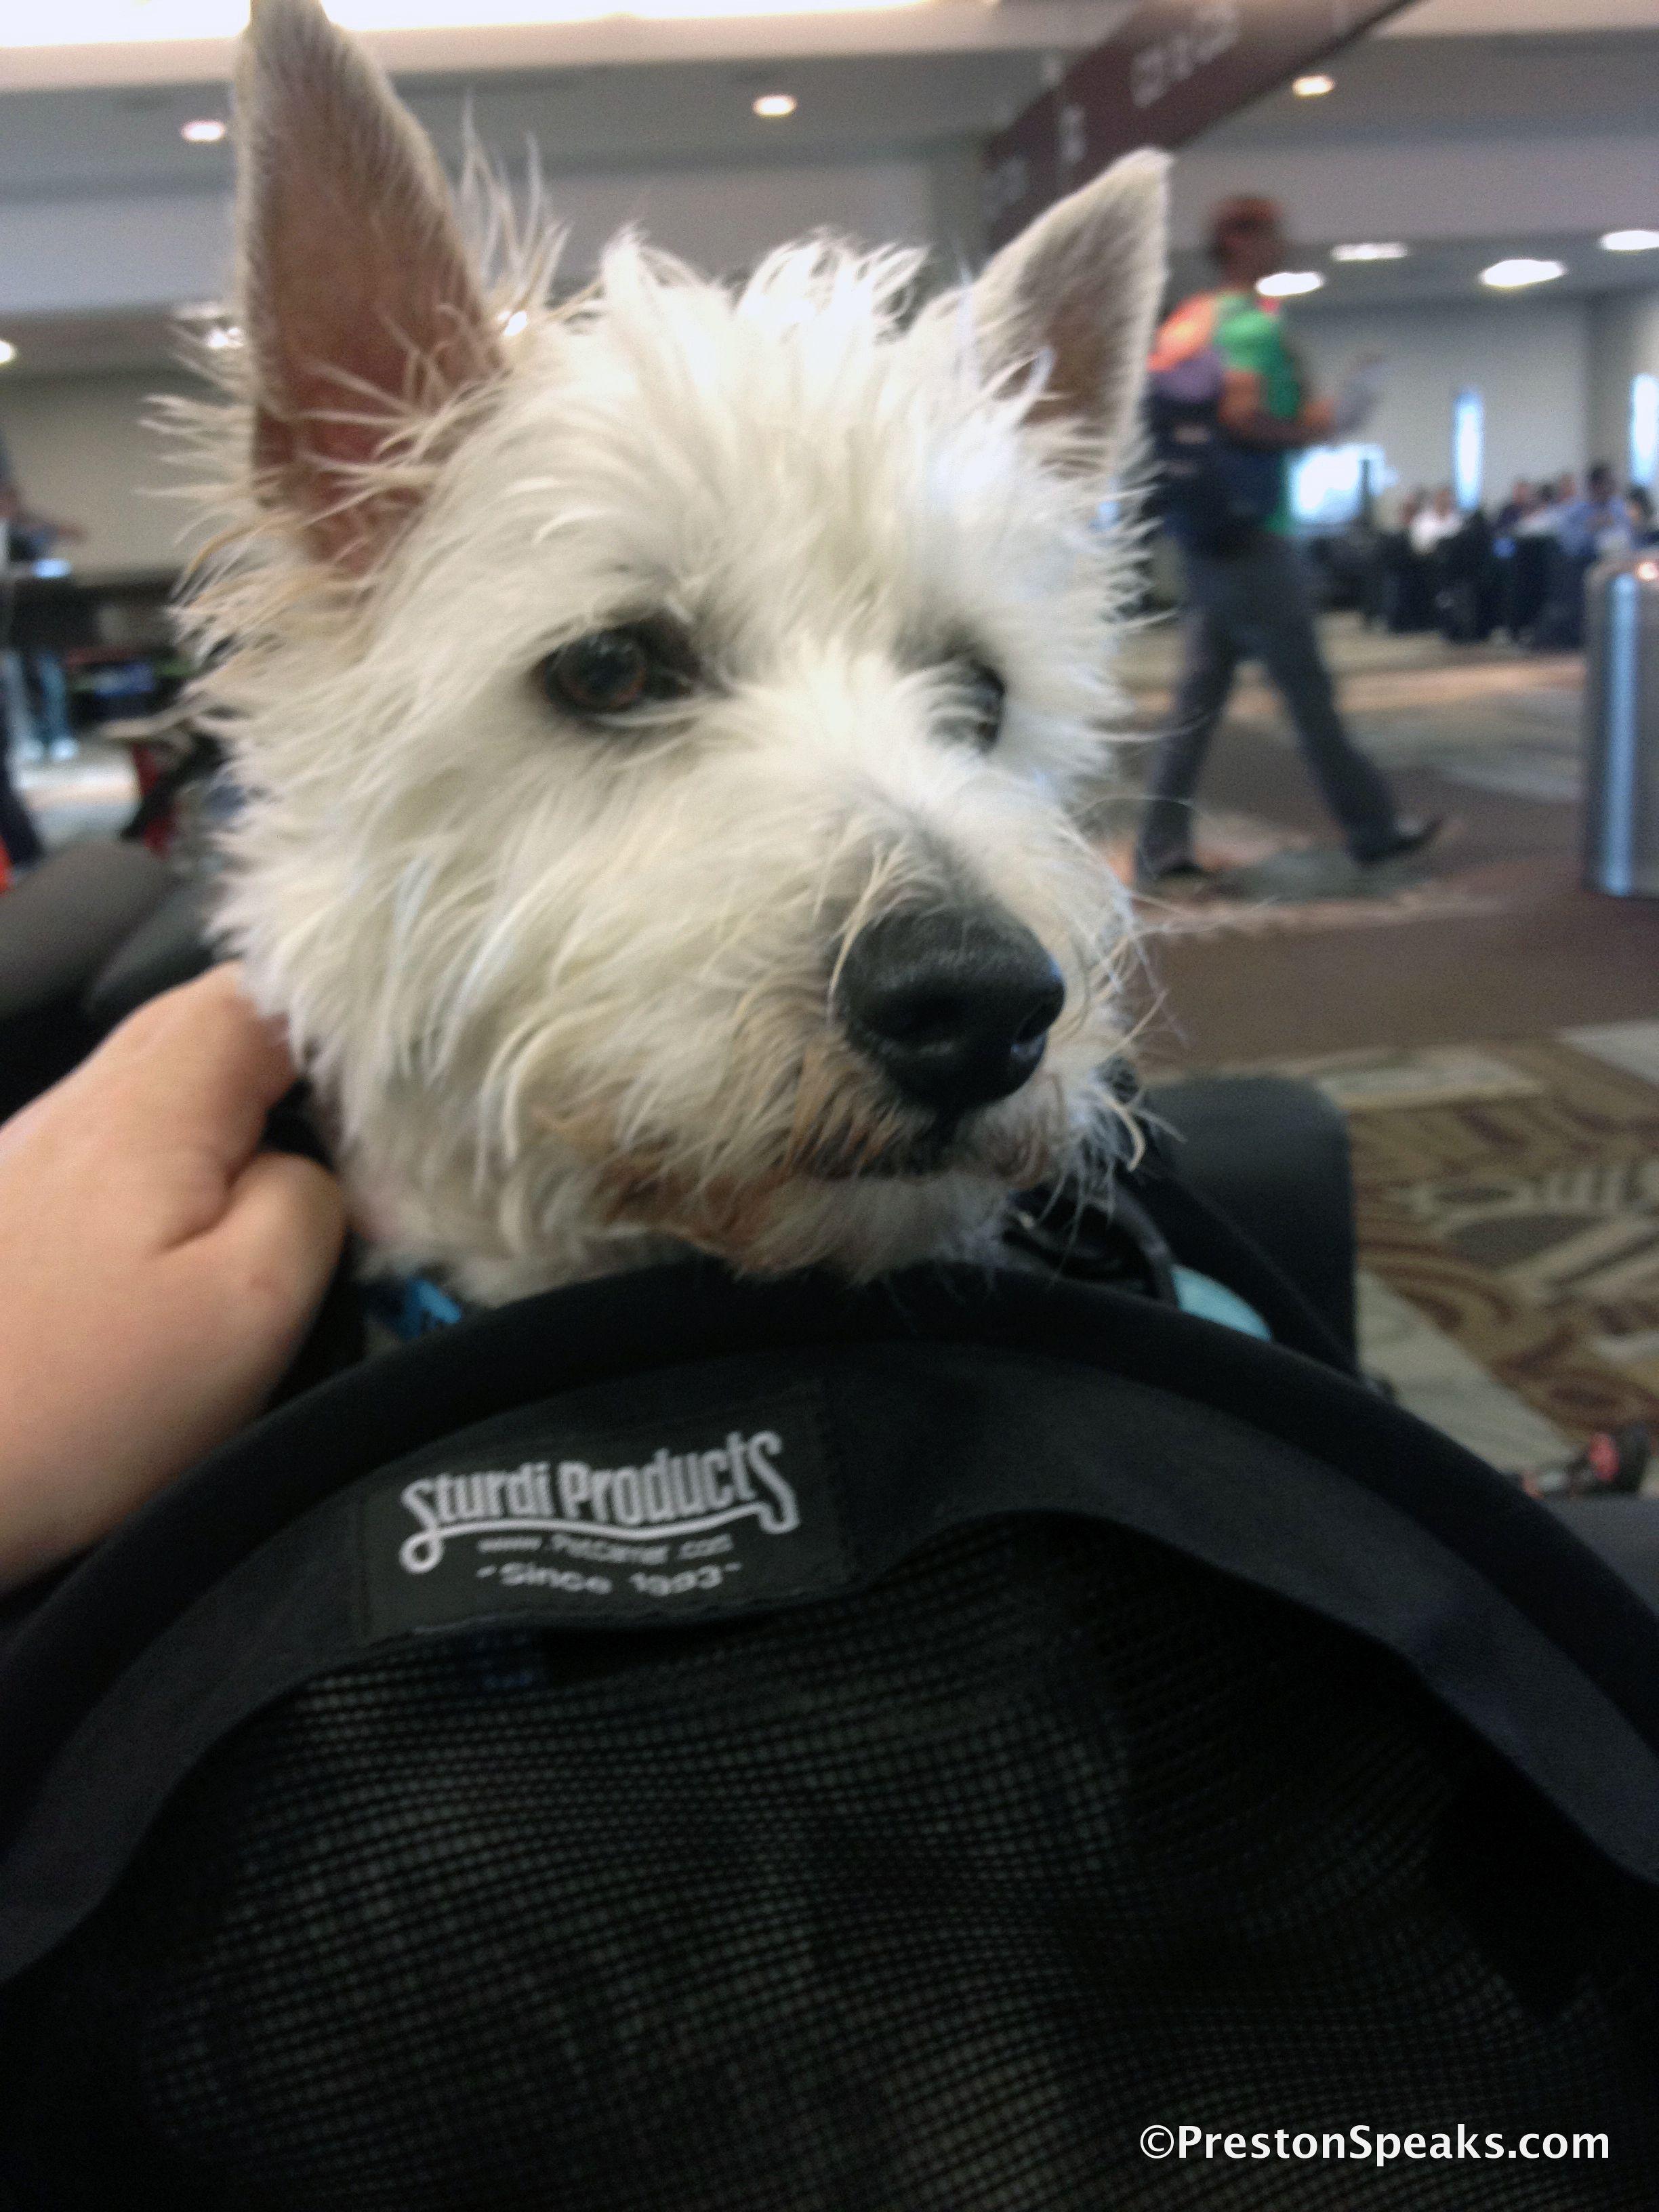 I Love My Travel Bag Www Prestonspeaks Com Westies Cute Dogs Dogs Puppies